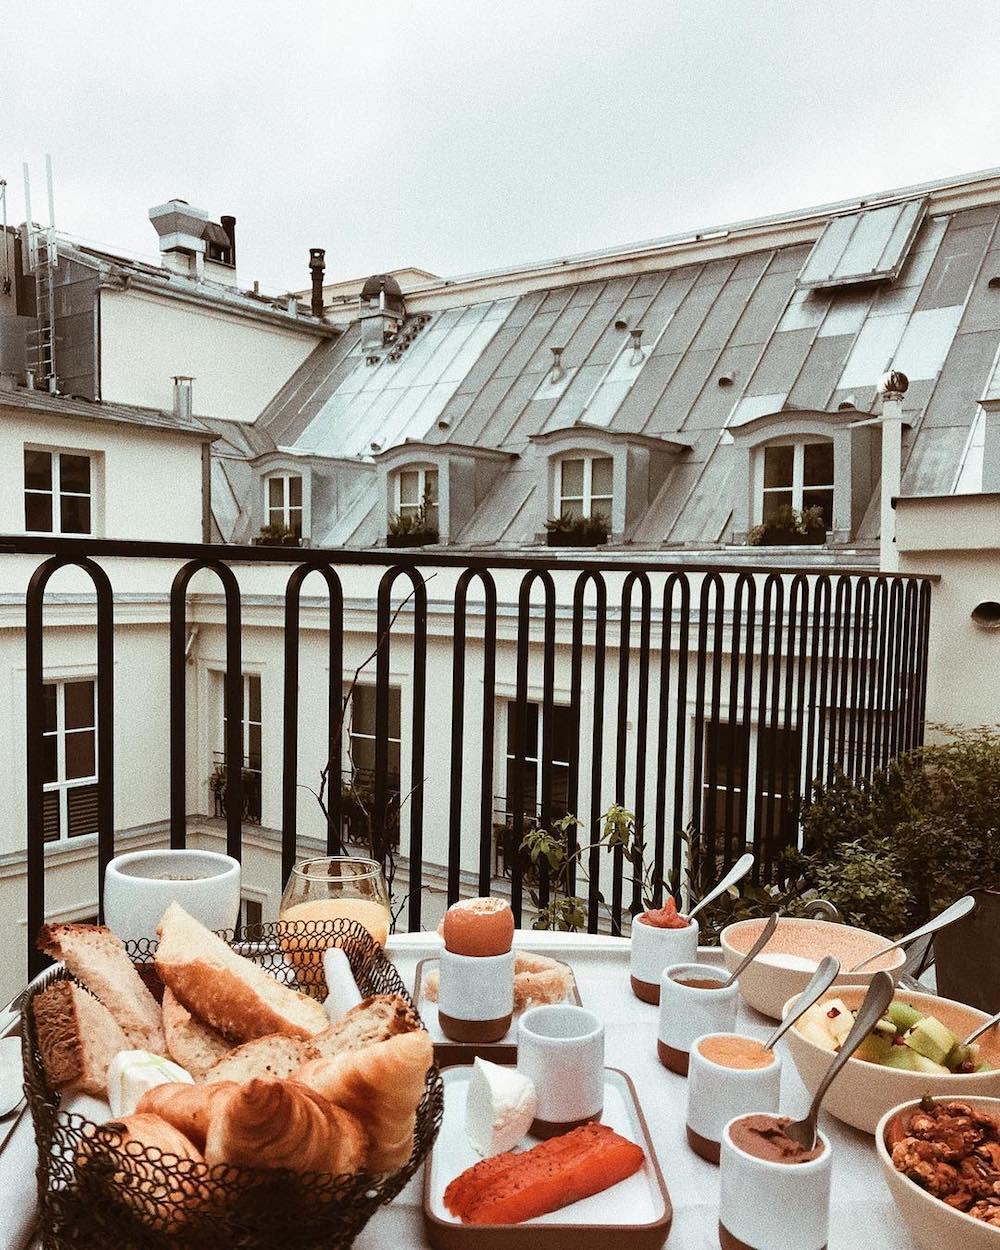 petit dejeuner terrasse hotel grands boulevards paris